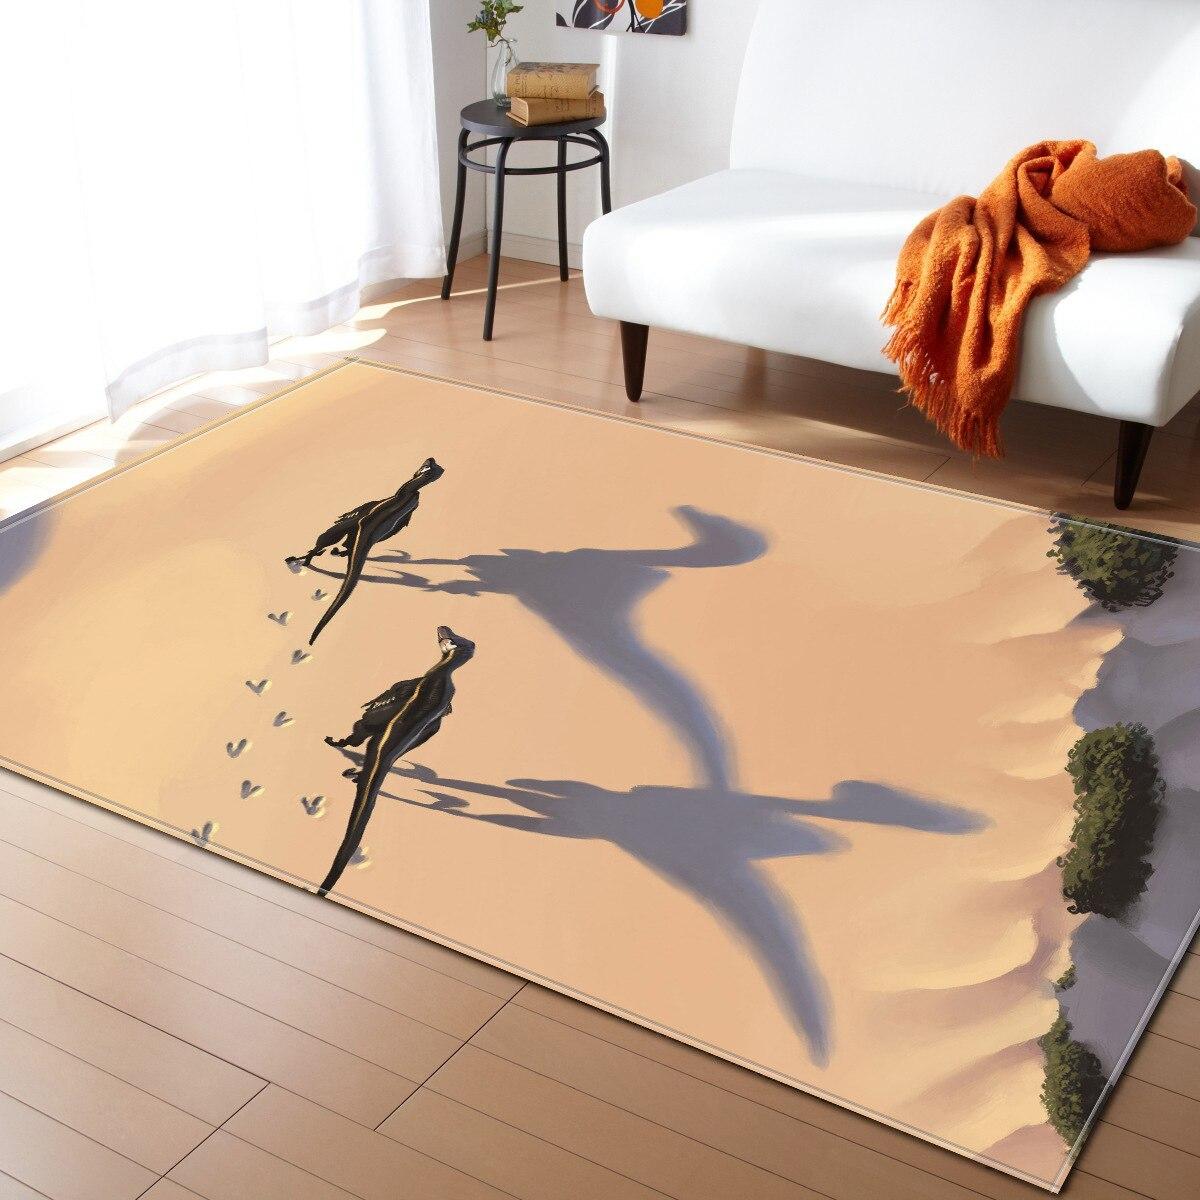 Ancient Dinosaur Carpet For Living Room Kids Bedroom Floor Mat Kitchen Decor Rug Table Rectangular Floor Mat